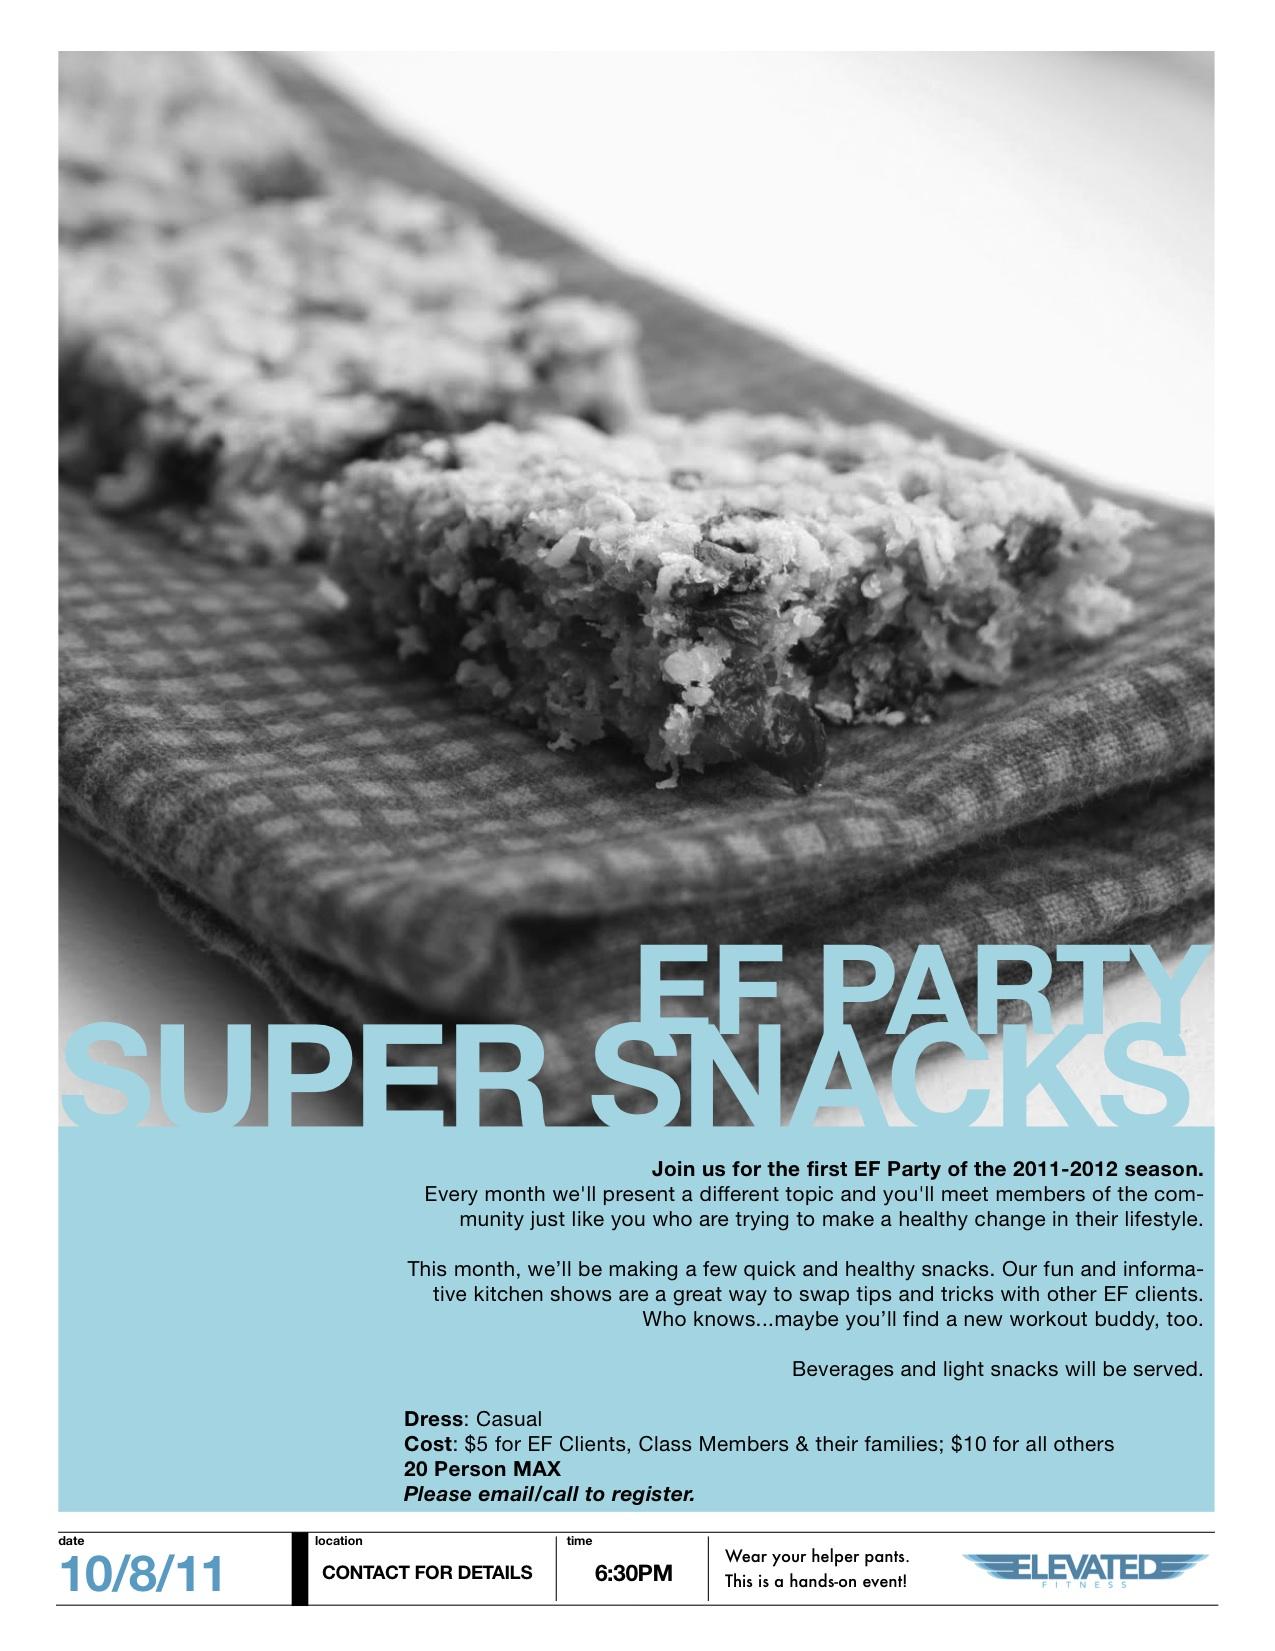 EF Party Super Snacks October 2011.jpg